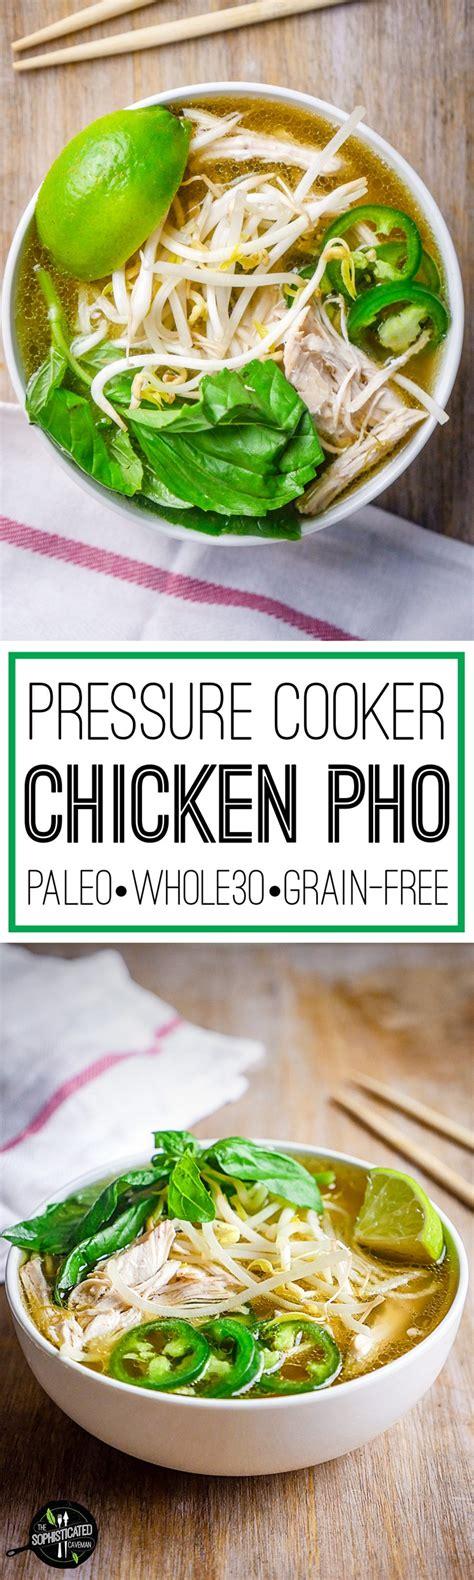 22 paleo instant pot recipes pressure cooking and paleo paleo leap autos post